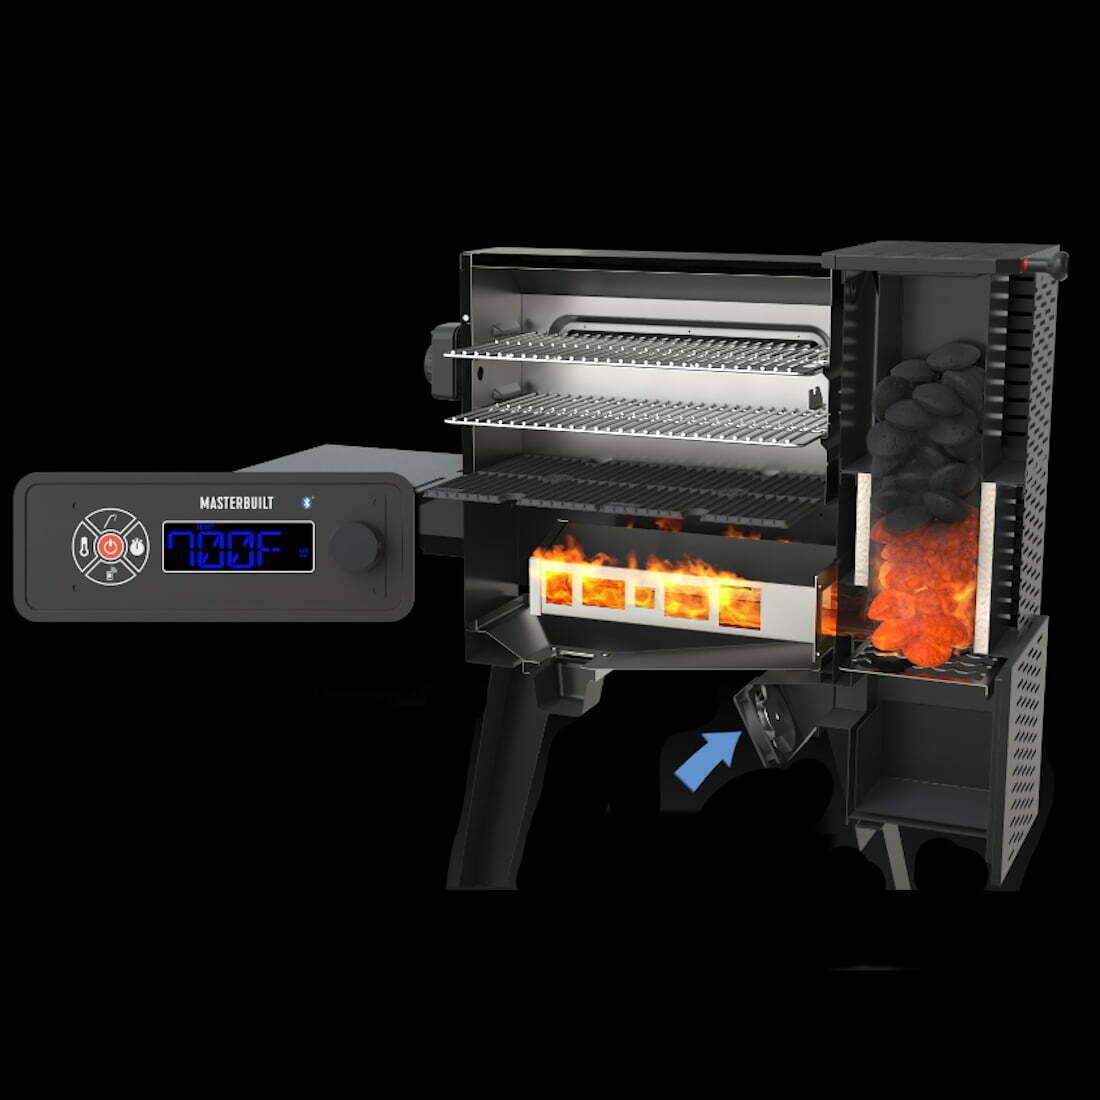 Masterbuilt Gravity Series 560 Charcoal Grill & Smoker